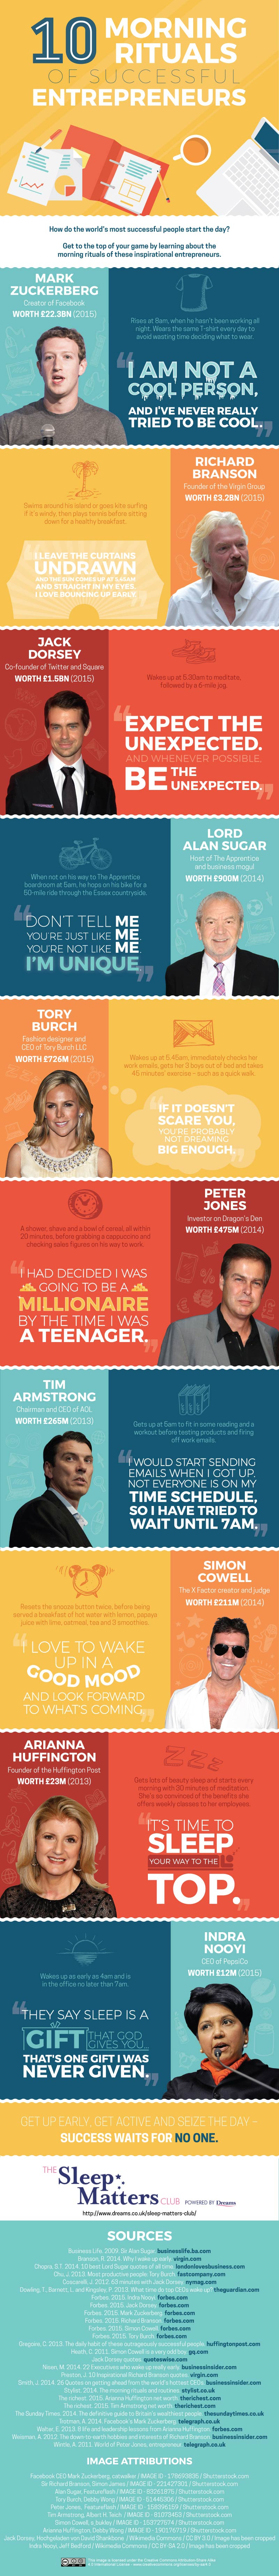 10-morning-rituals-of-successful-entrepreneurs